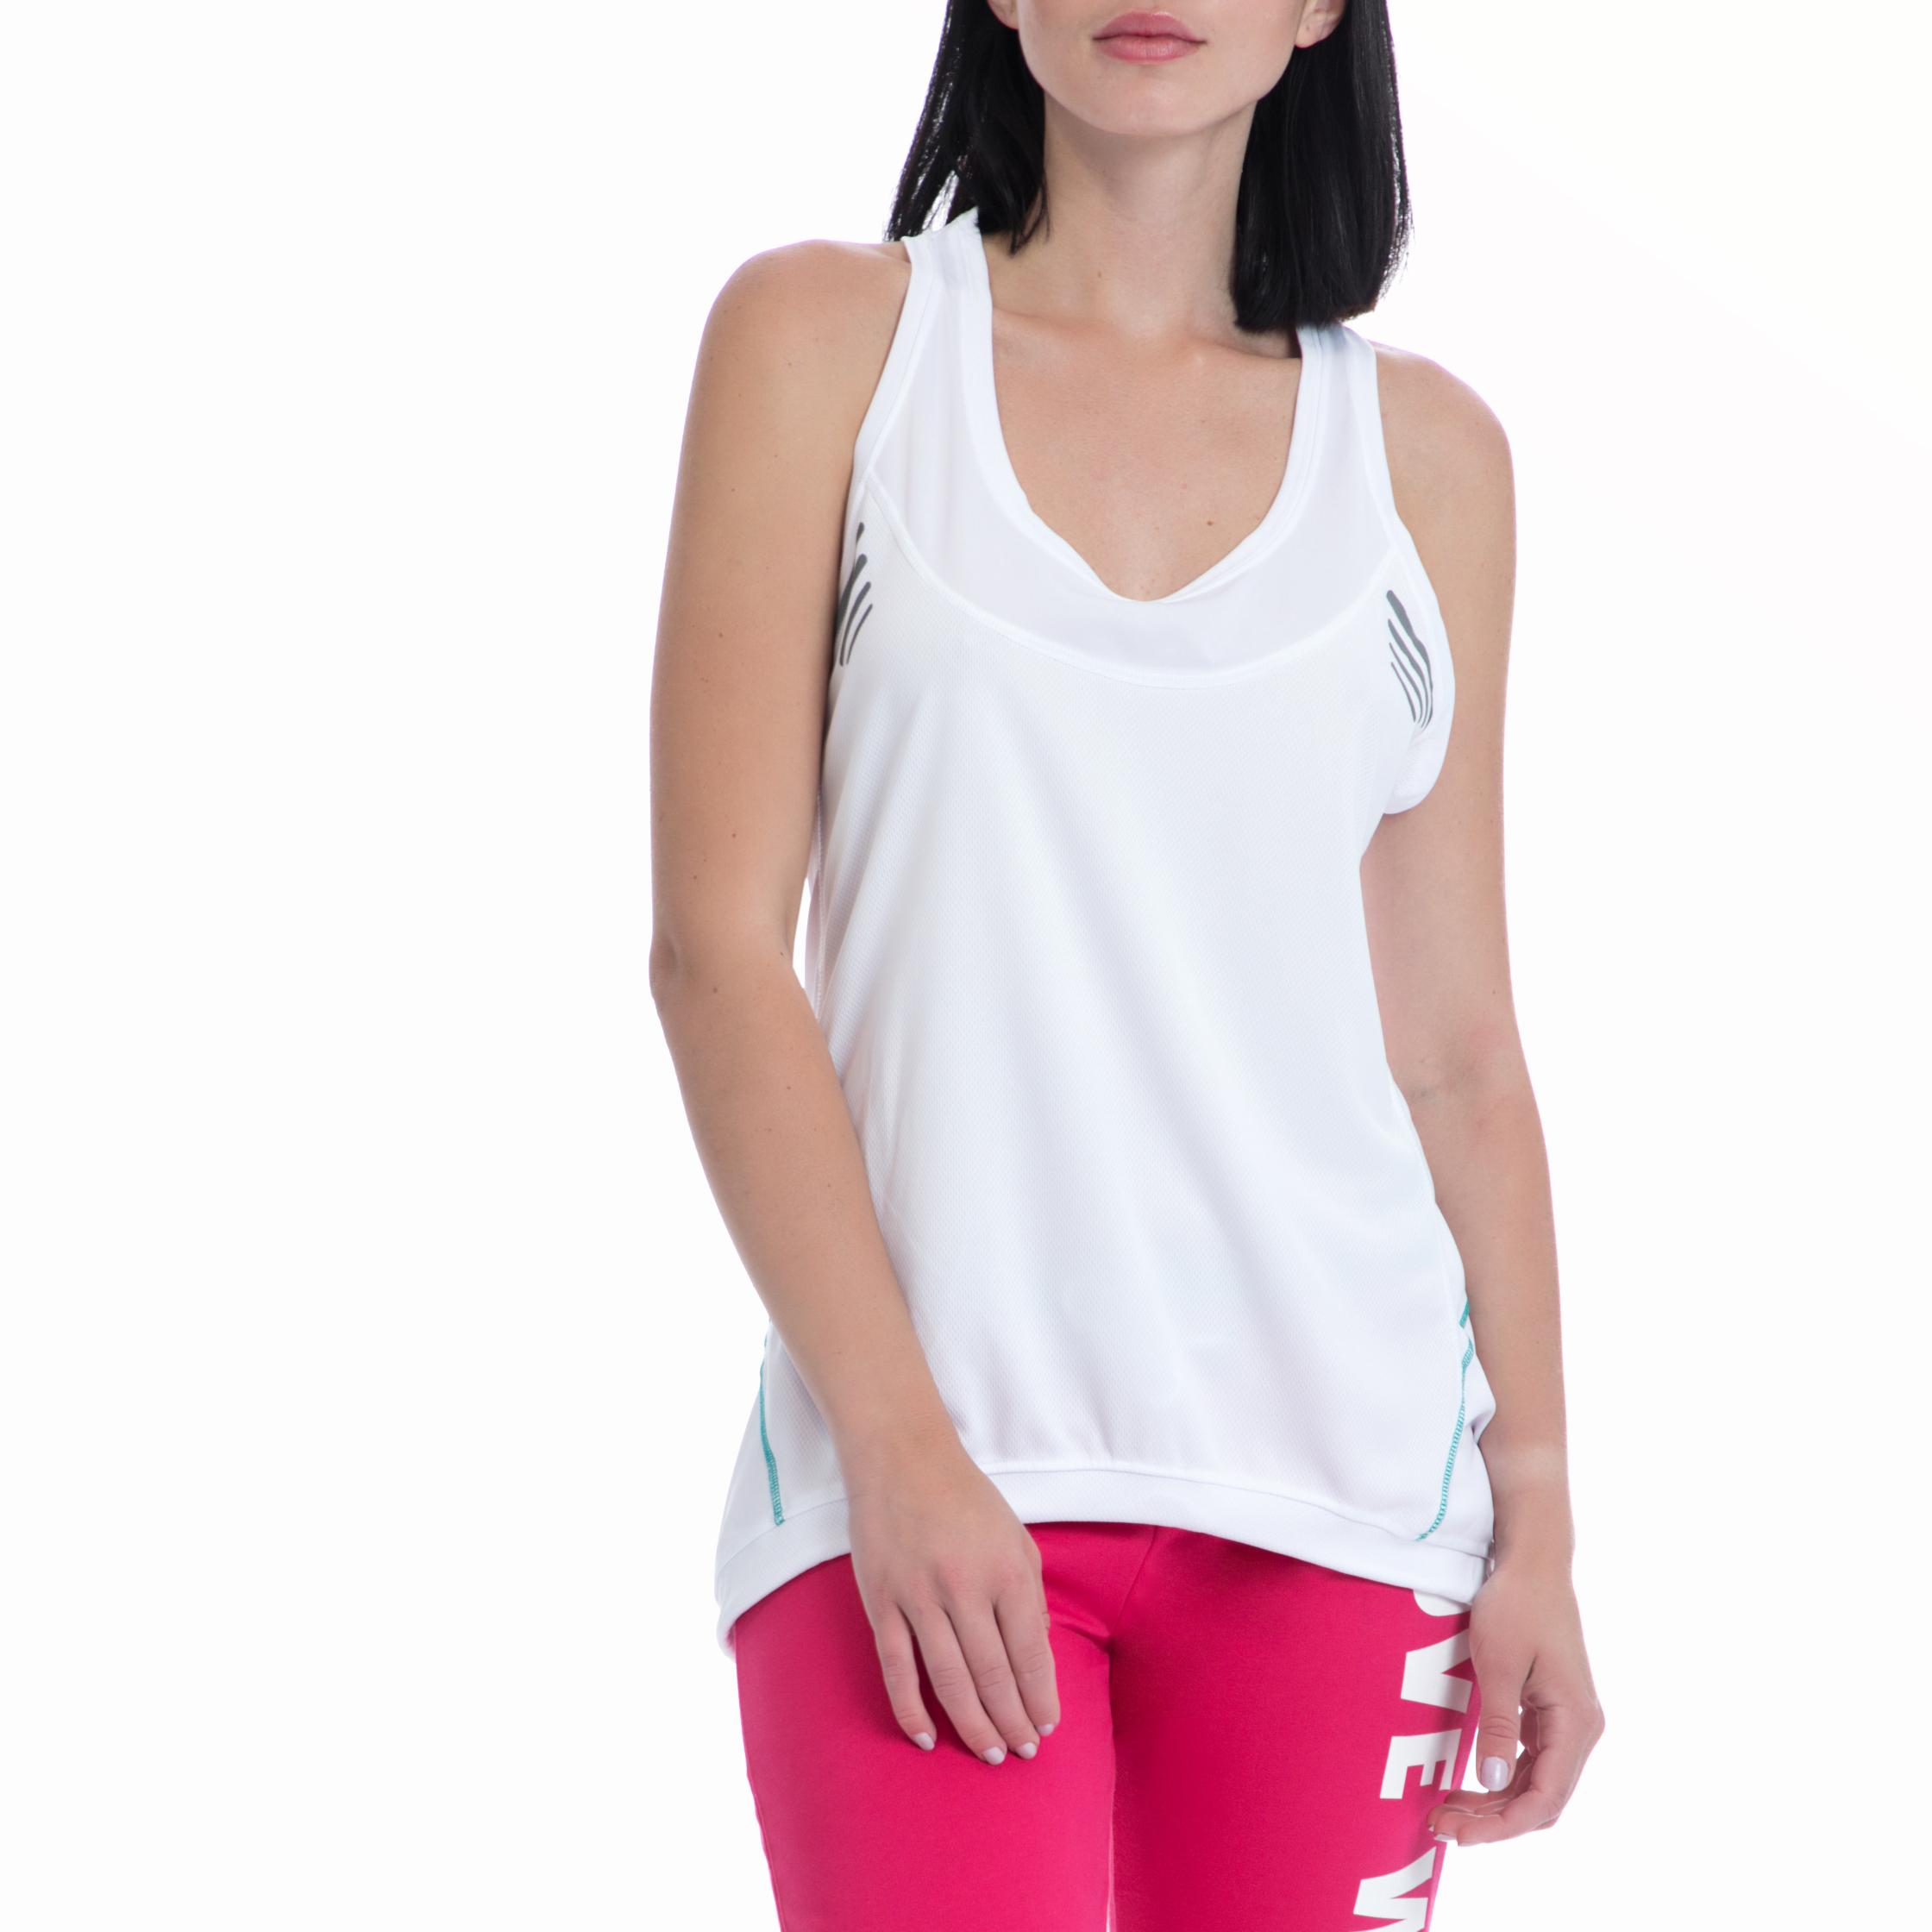 BODYTALK - Γυναικεία αμάνικη μπλούζα BODYTALK λευκή γυναικεία ρούχα αθλητικά t shirt τοπ